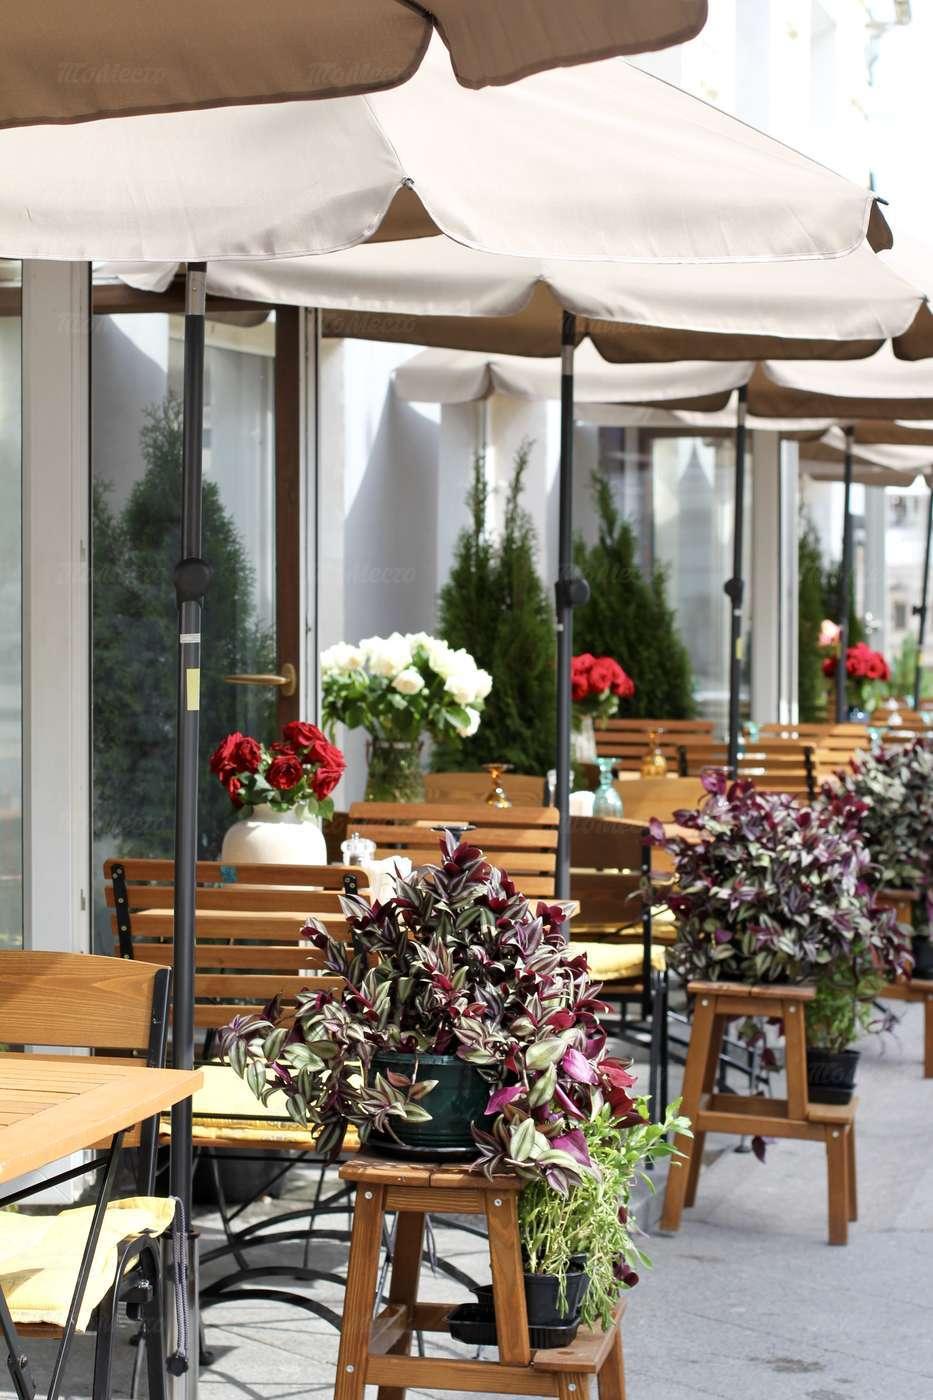 Ресторан IL LETTERATO (Литератор) На Большой Дмитровке фото 10